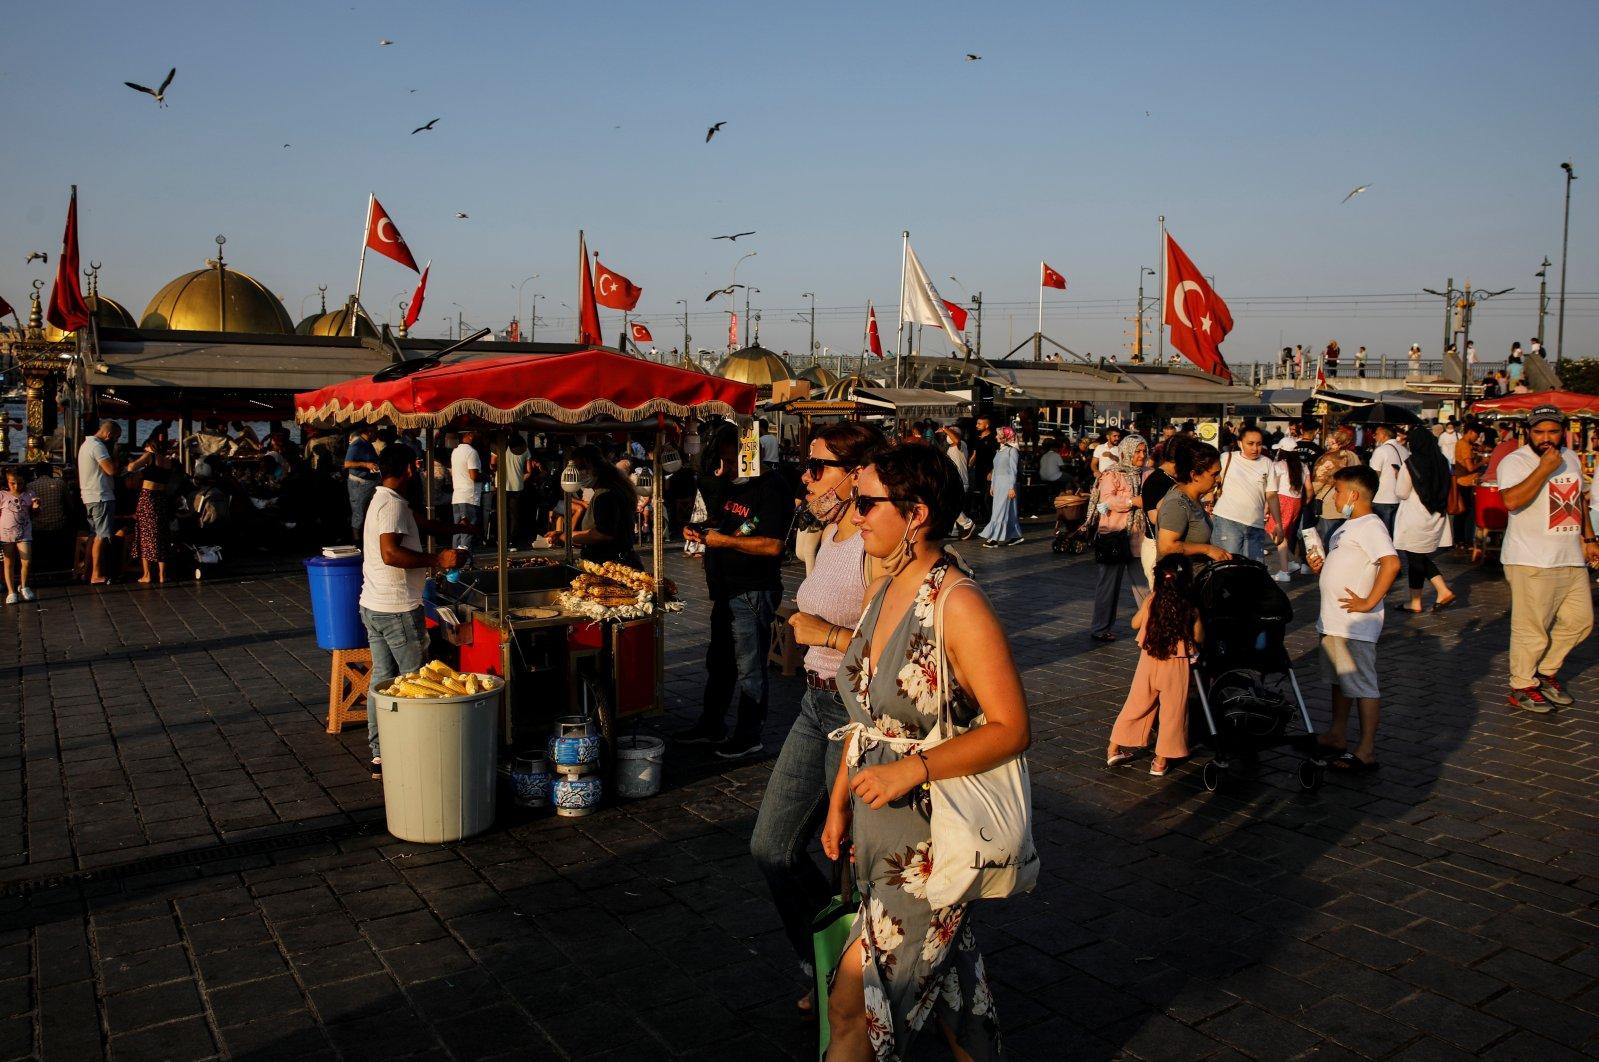 People walk along the Eminönü neighborhood of Istanbul, Turkey, July 12, 2021. (Reuters Photo)